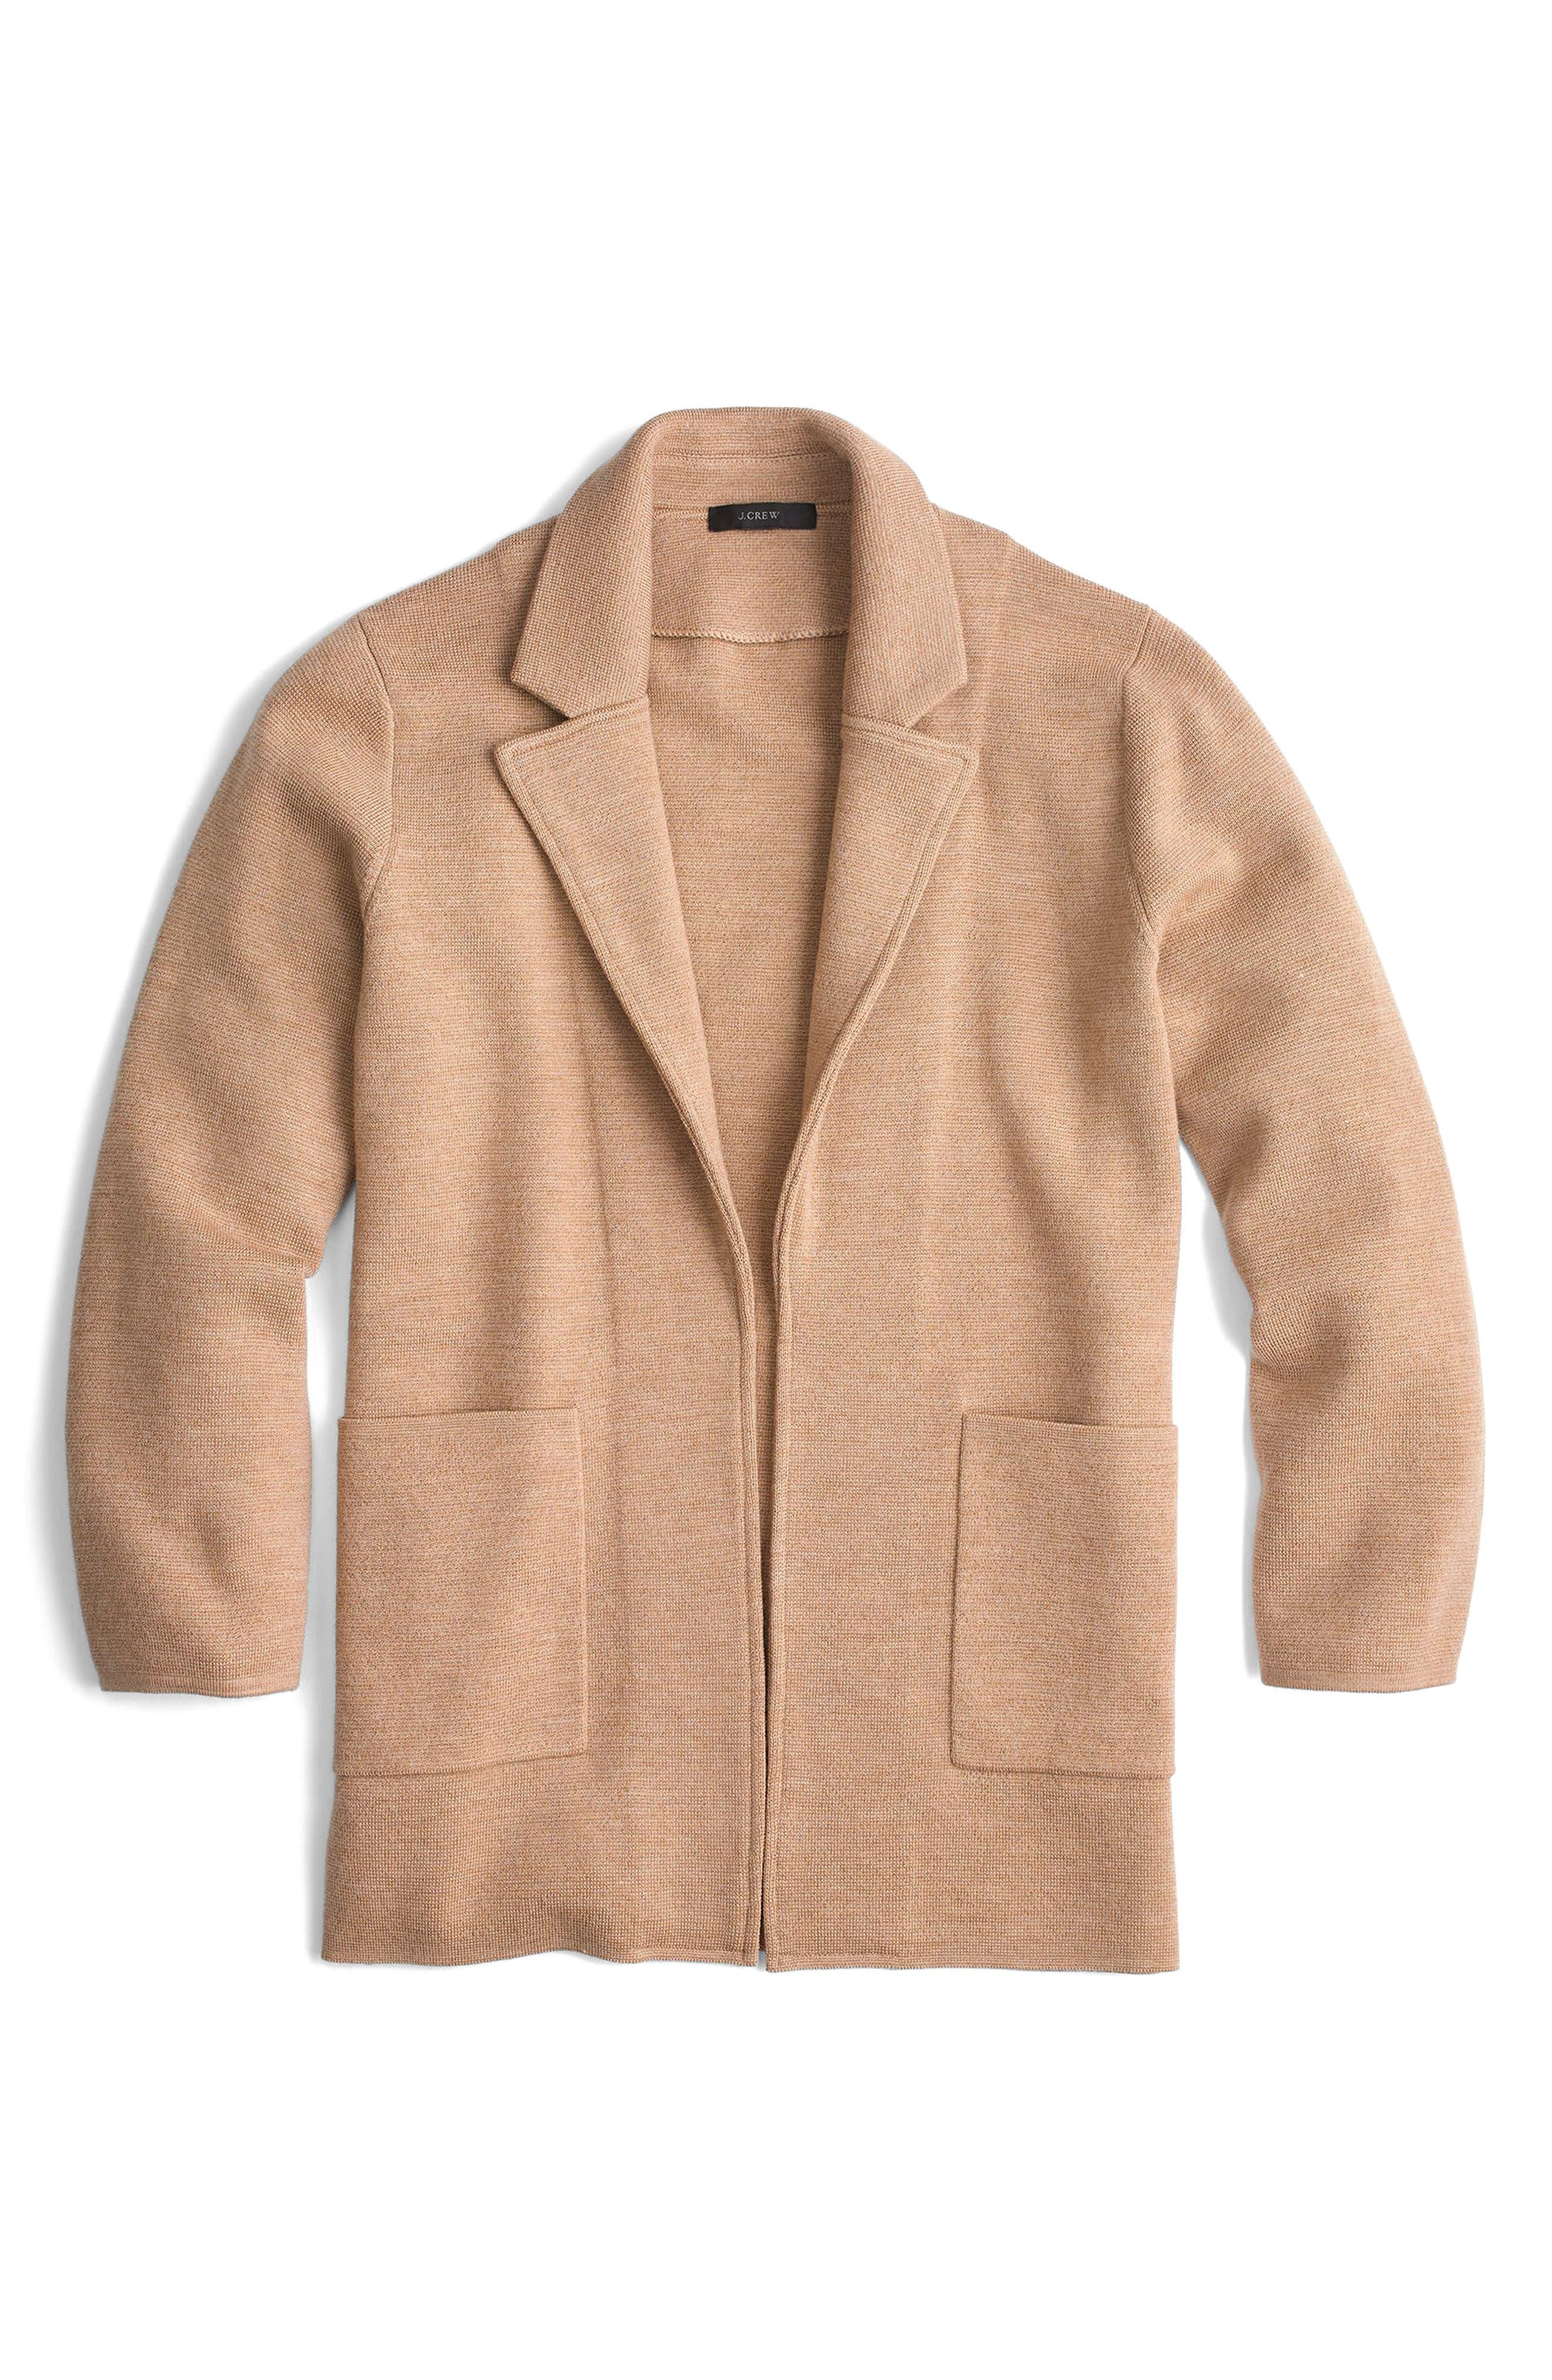 New Lightweight Sweater Blazer,                             Main thumbnail 1, color,                             250